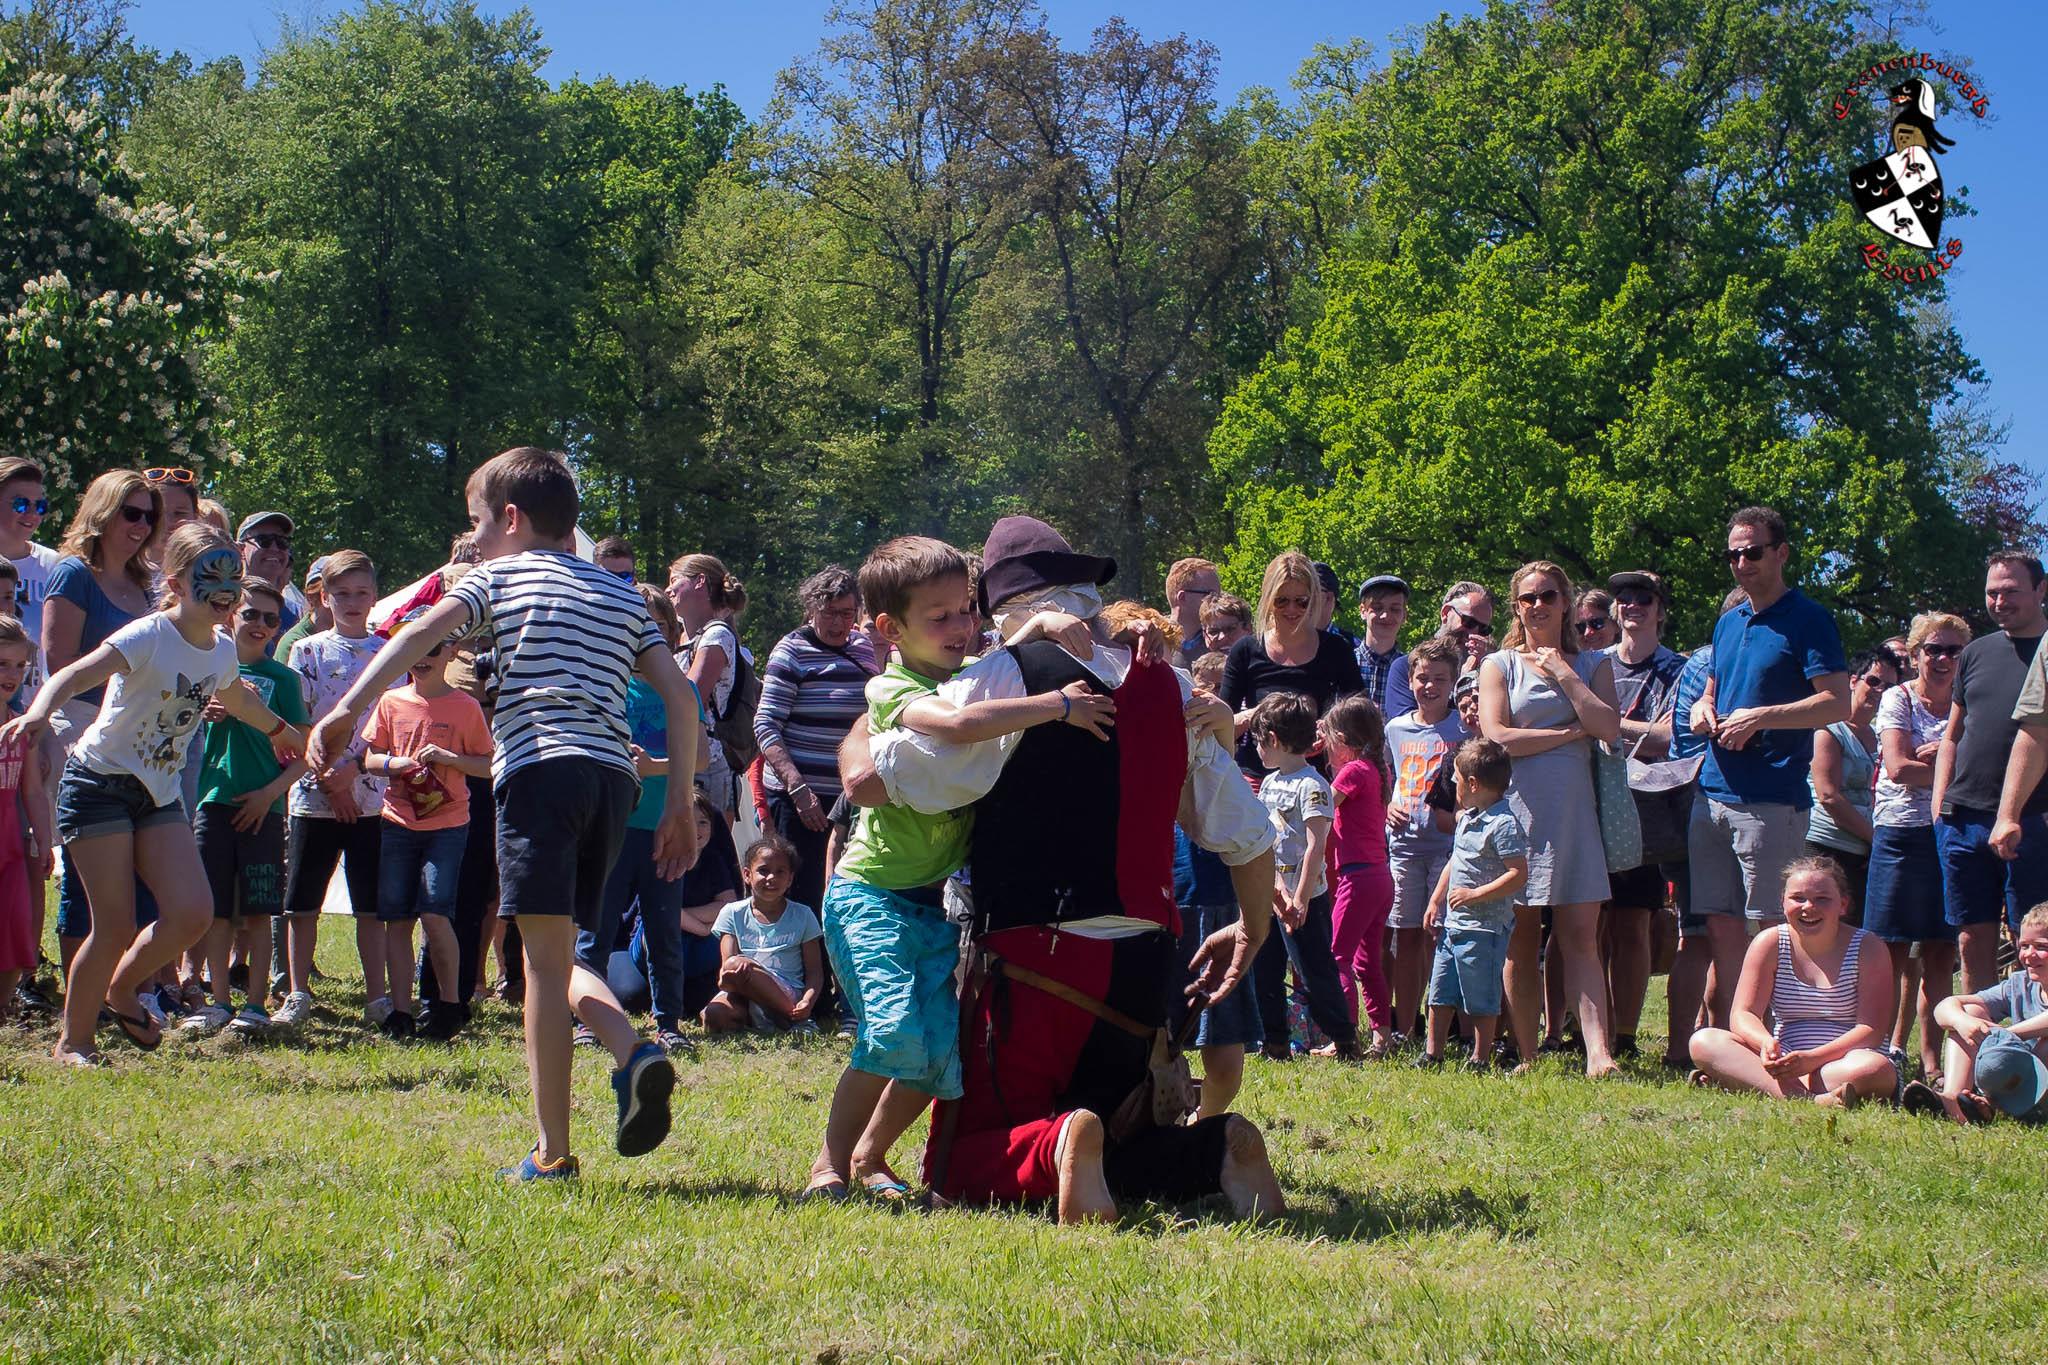 Middeleeuws-Festijn-Cannenburgh-2018-Algemeen-Ellen-la-Faille-12